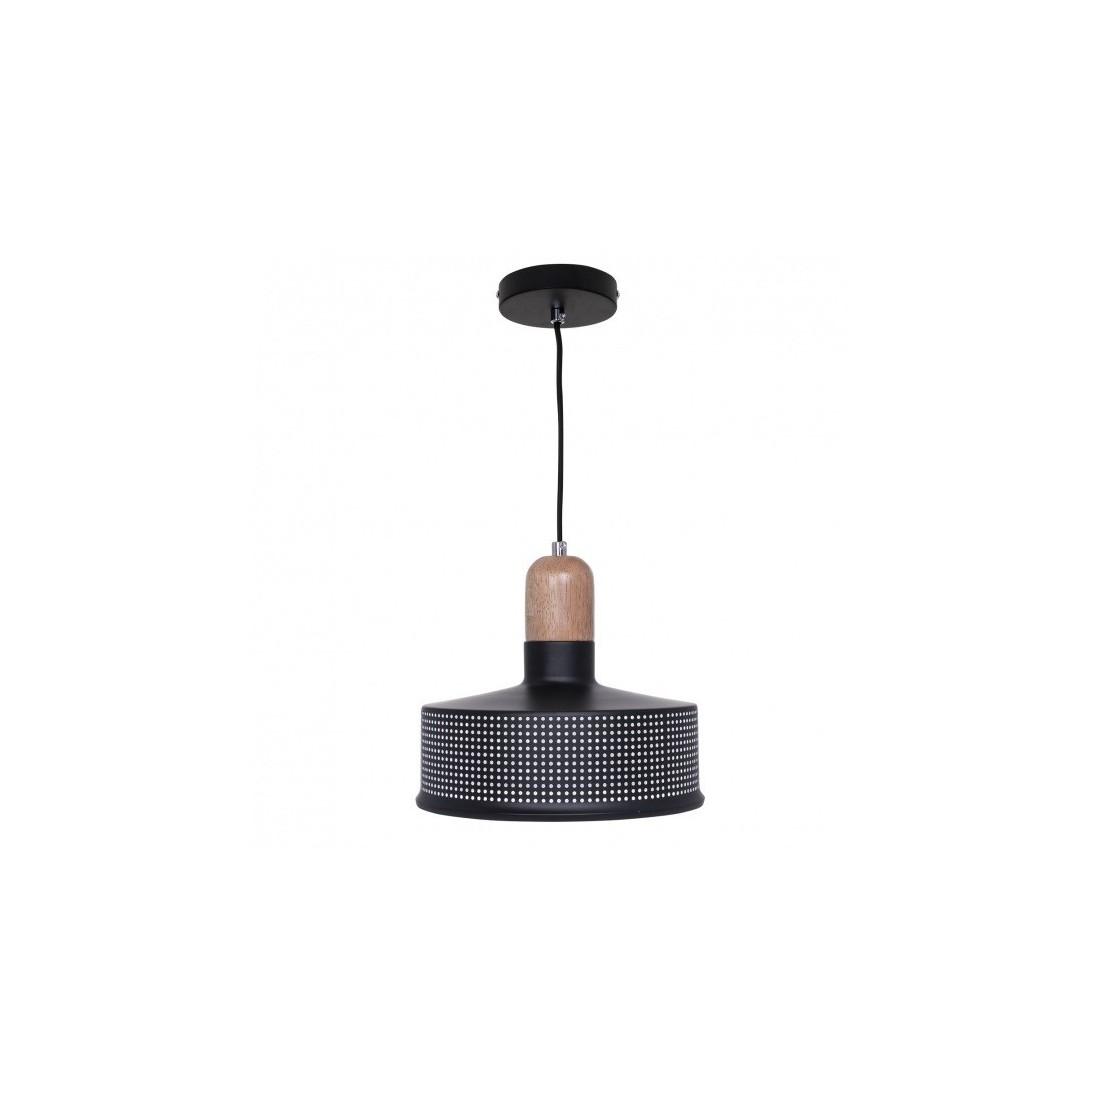 Luminarias de techo plafones para sal n con pantalla - Plafones para salon ...